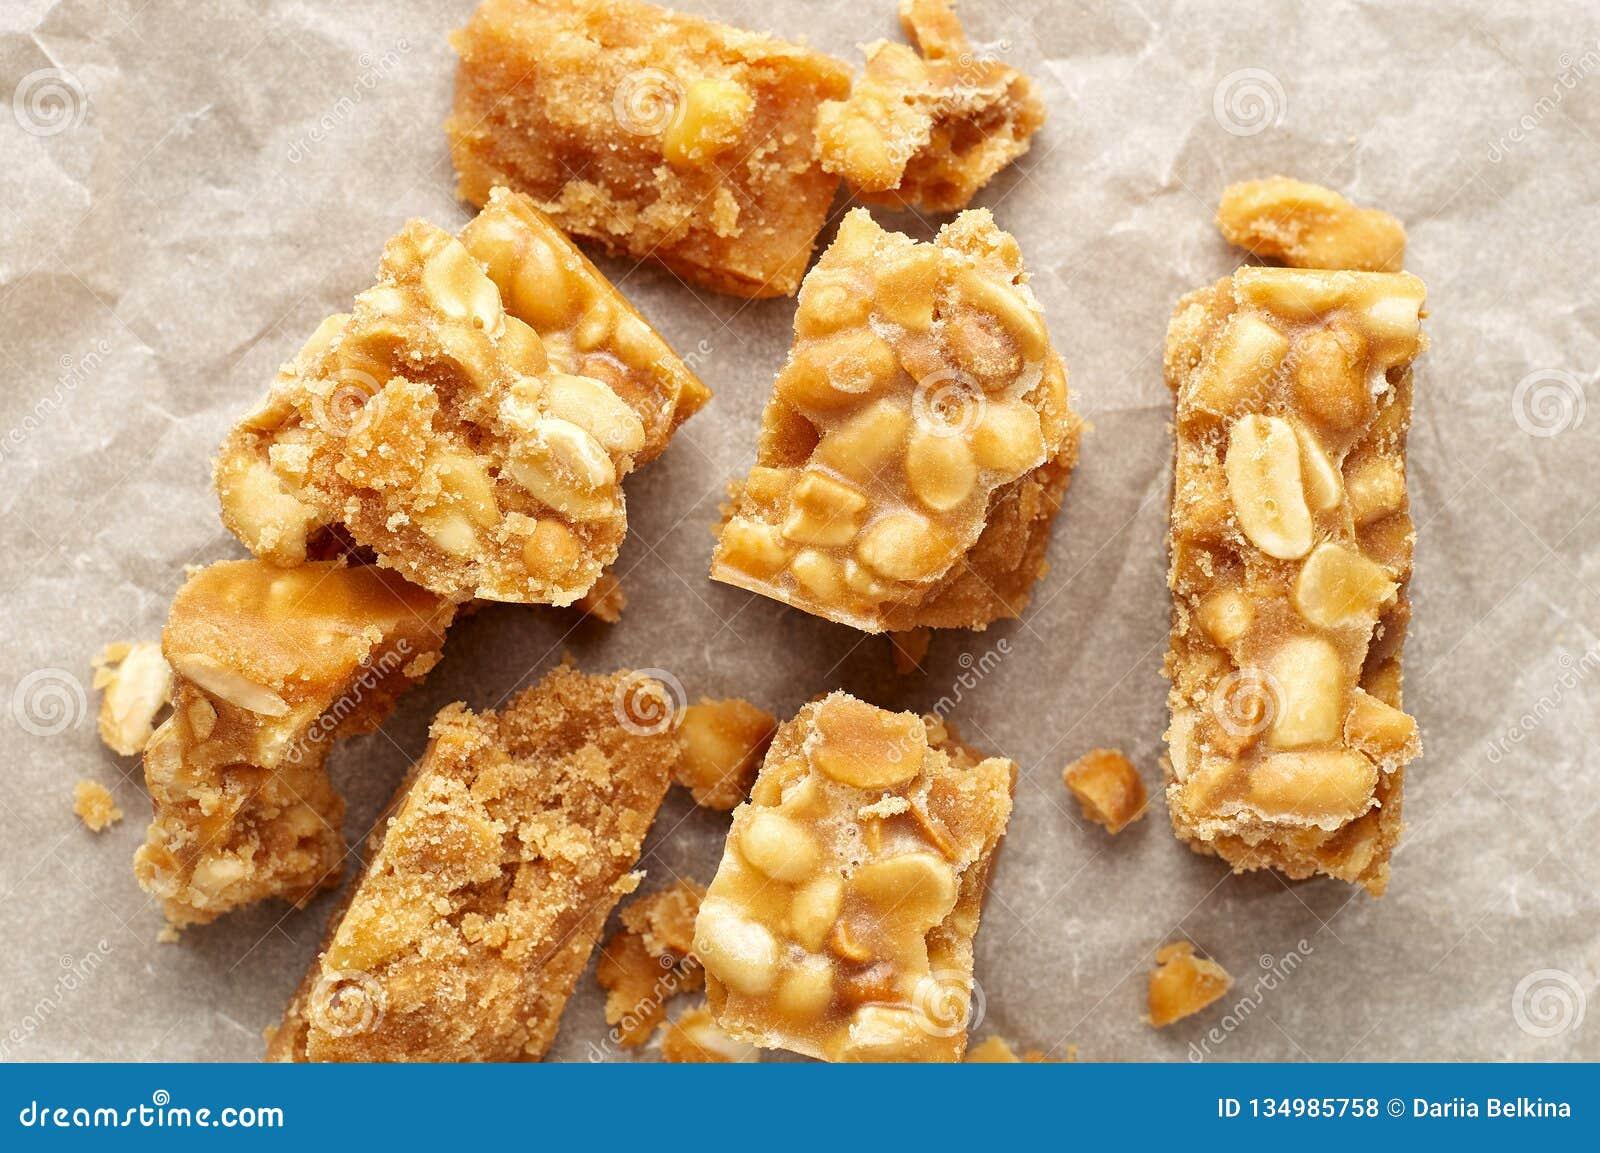 Old Fashioned Buttermilk Penuche Fudge Candy With Peanuts